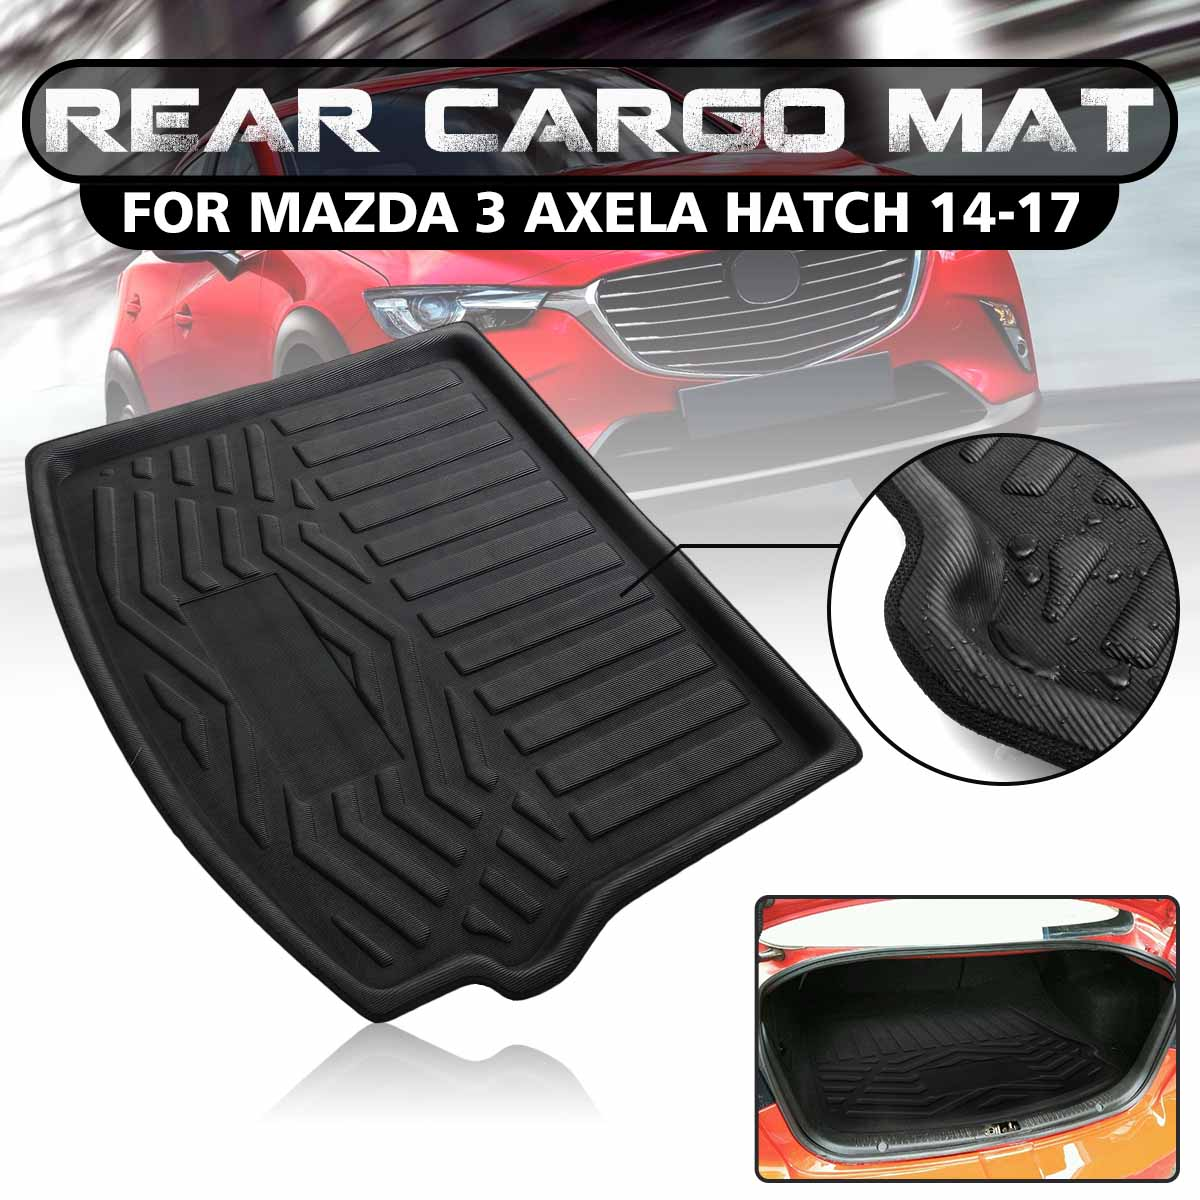 Audew Hatch Rear Cargo Mat Trunk Tray Boot Liner Floor Pad For Mazda 3 Axela 14 17